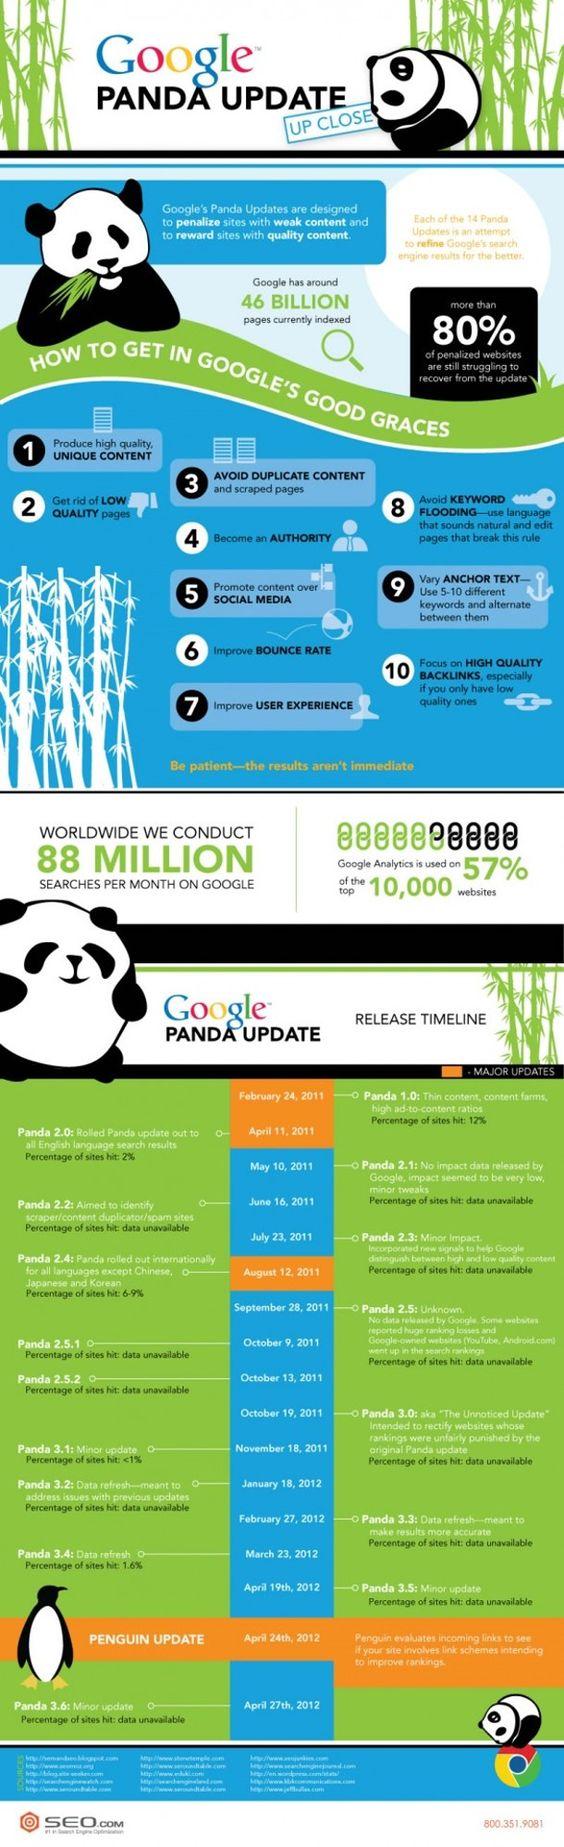 Las actualizaciones de #GooglePanda via @tessaprincess1